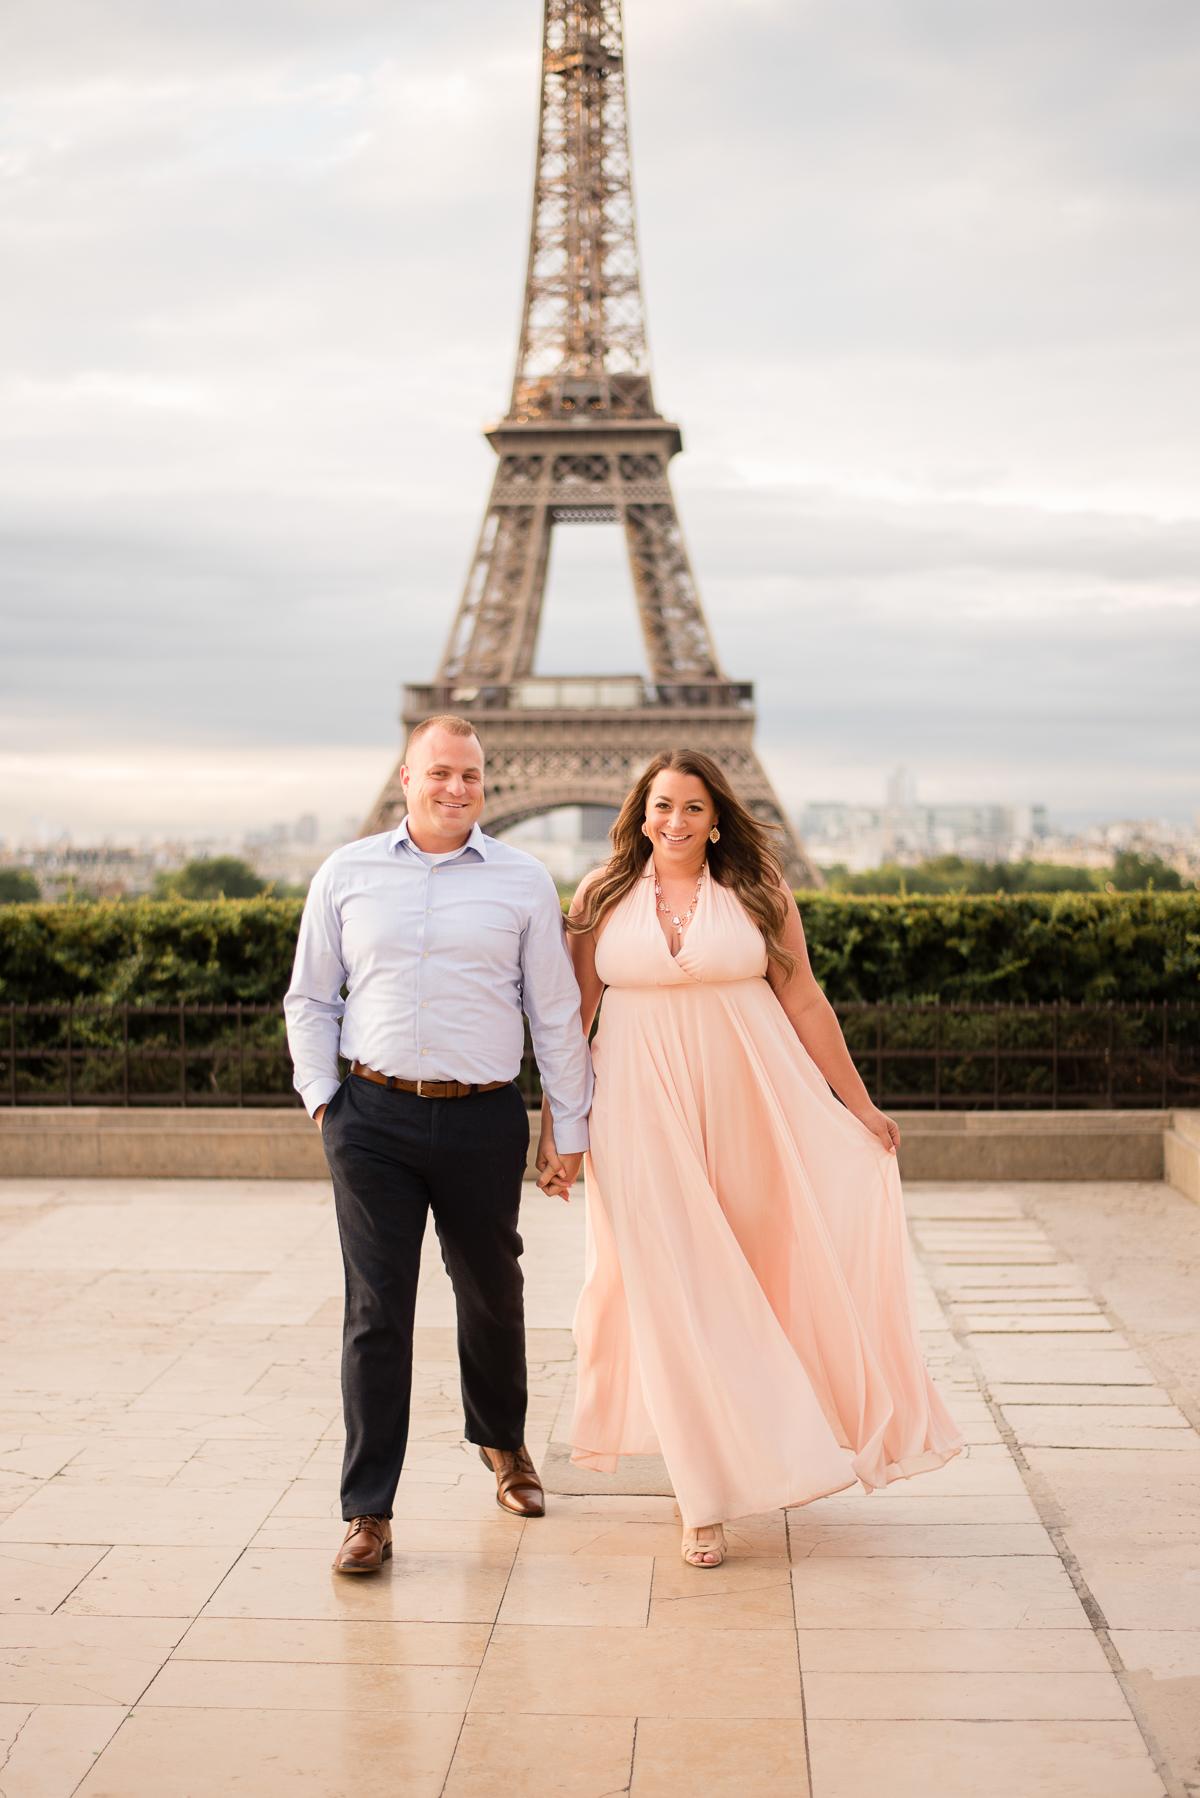 Romantic-Parisian-Photo-Session-Eiffel-Tower-Photographers,-Katie-Donnelly-Photography_001.jpg